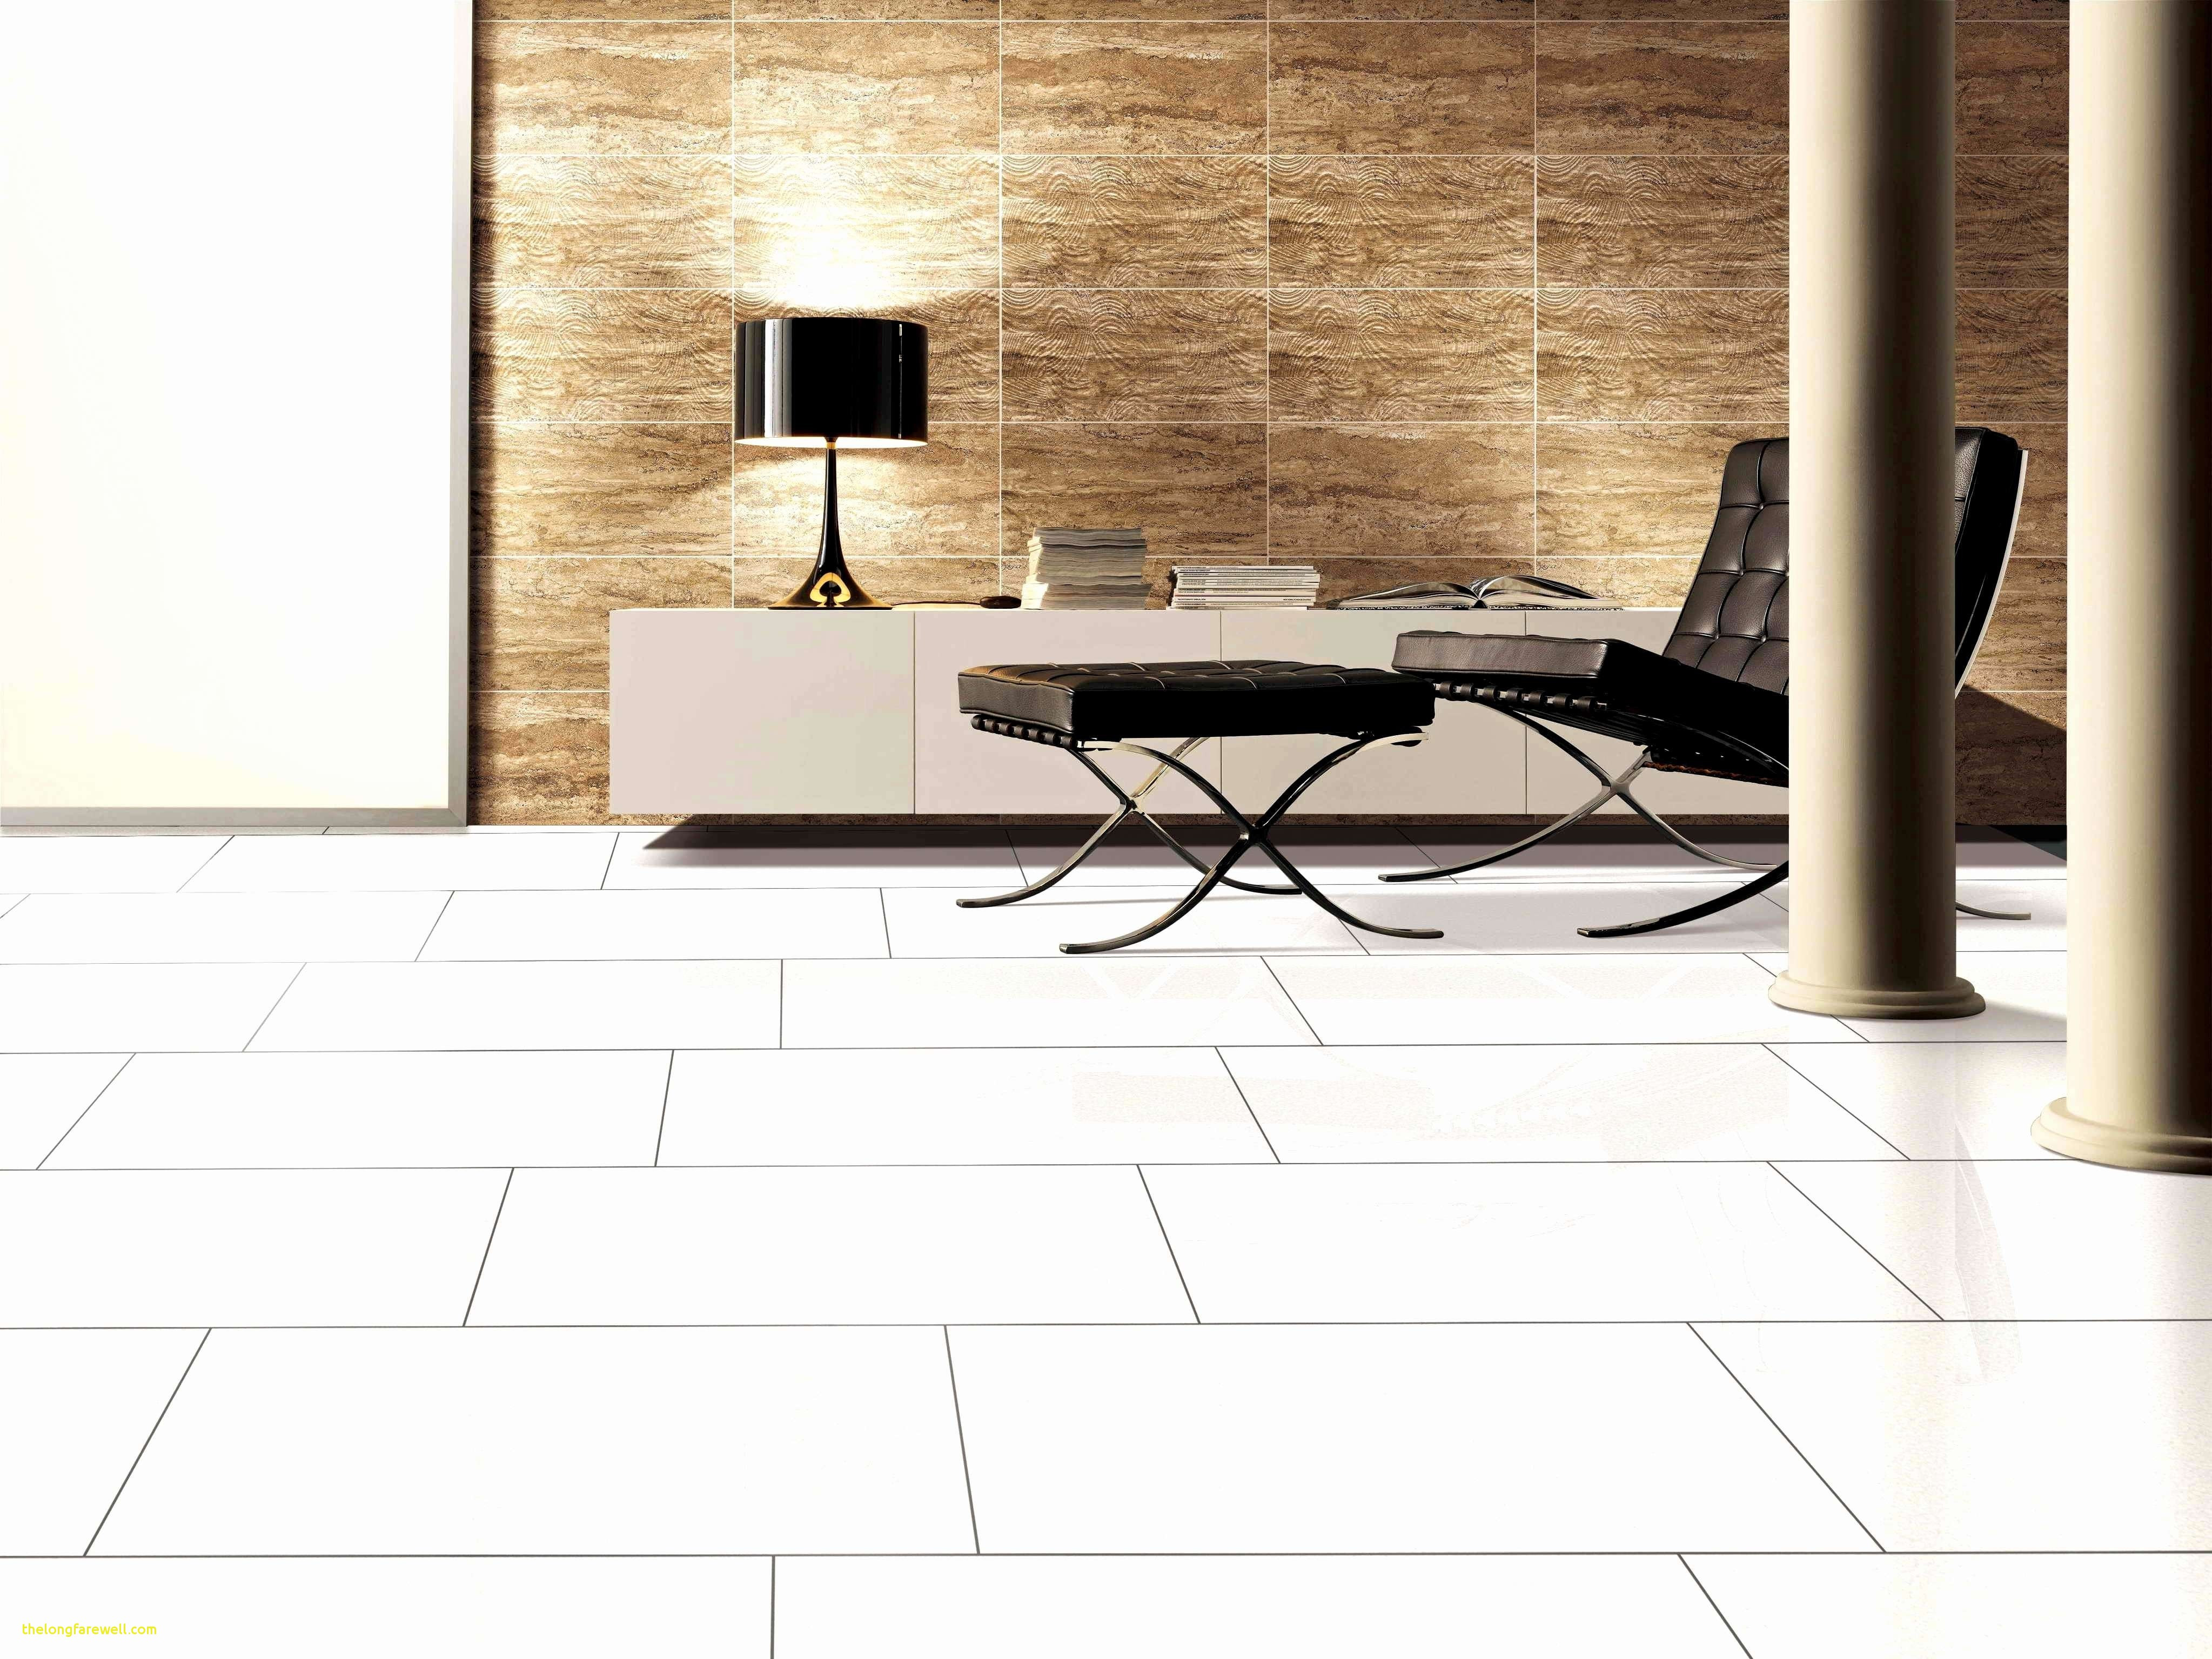 dark hardwood laminate flooring of lovely flooring for the bathroom bathroom ideas and home decoration throughout mosaic bathroom designs refrence new tile floor mosaic bathroom 0d new bathroom floor tiles home